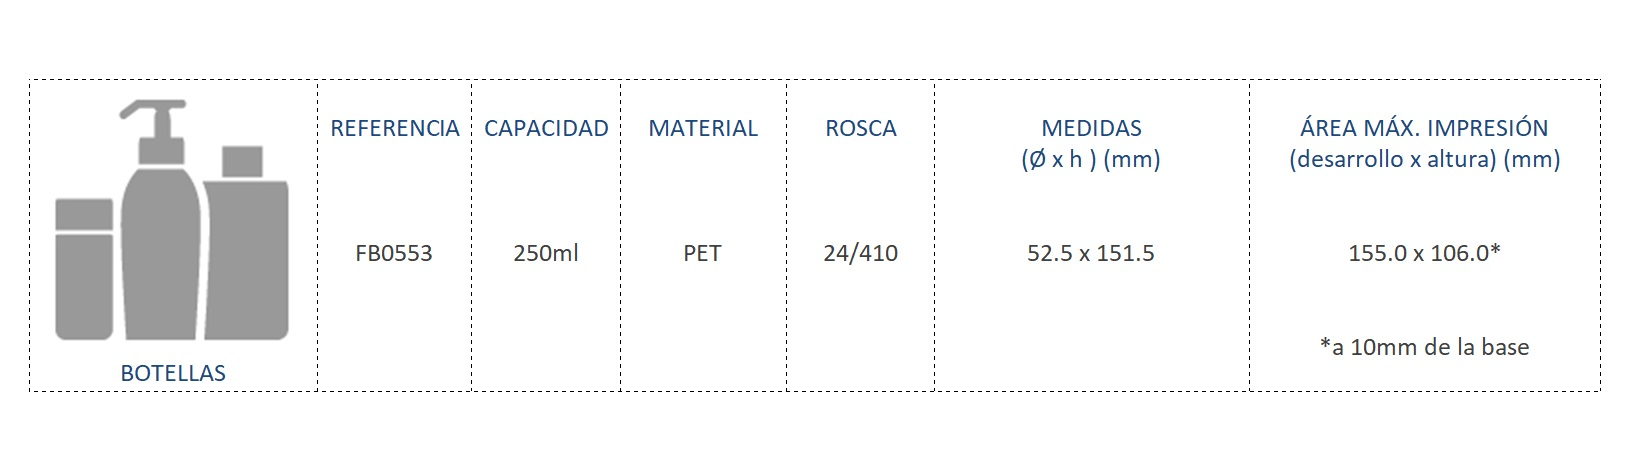 Cuadro de materiales botella FB0553